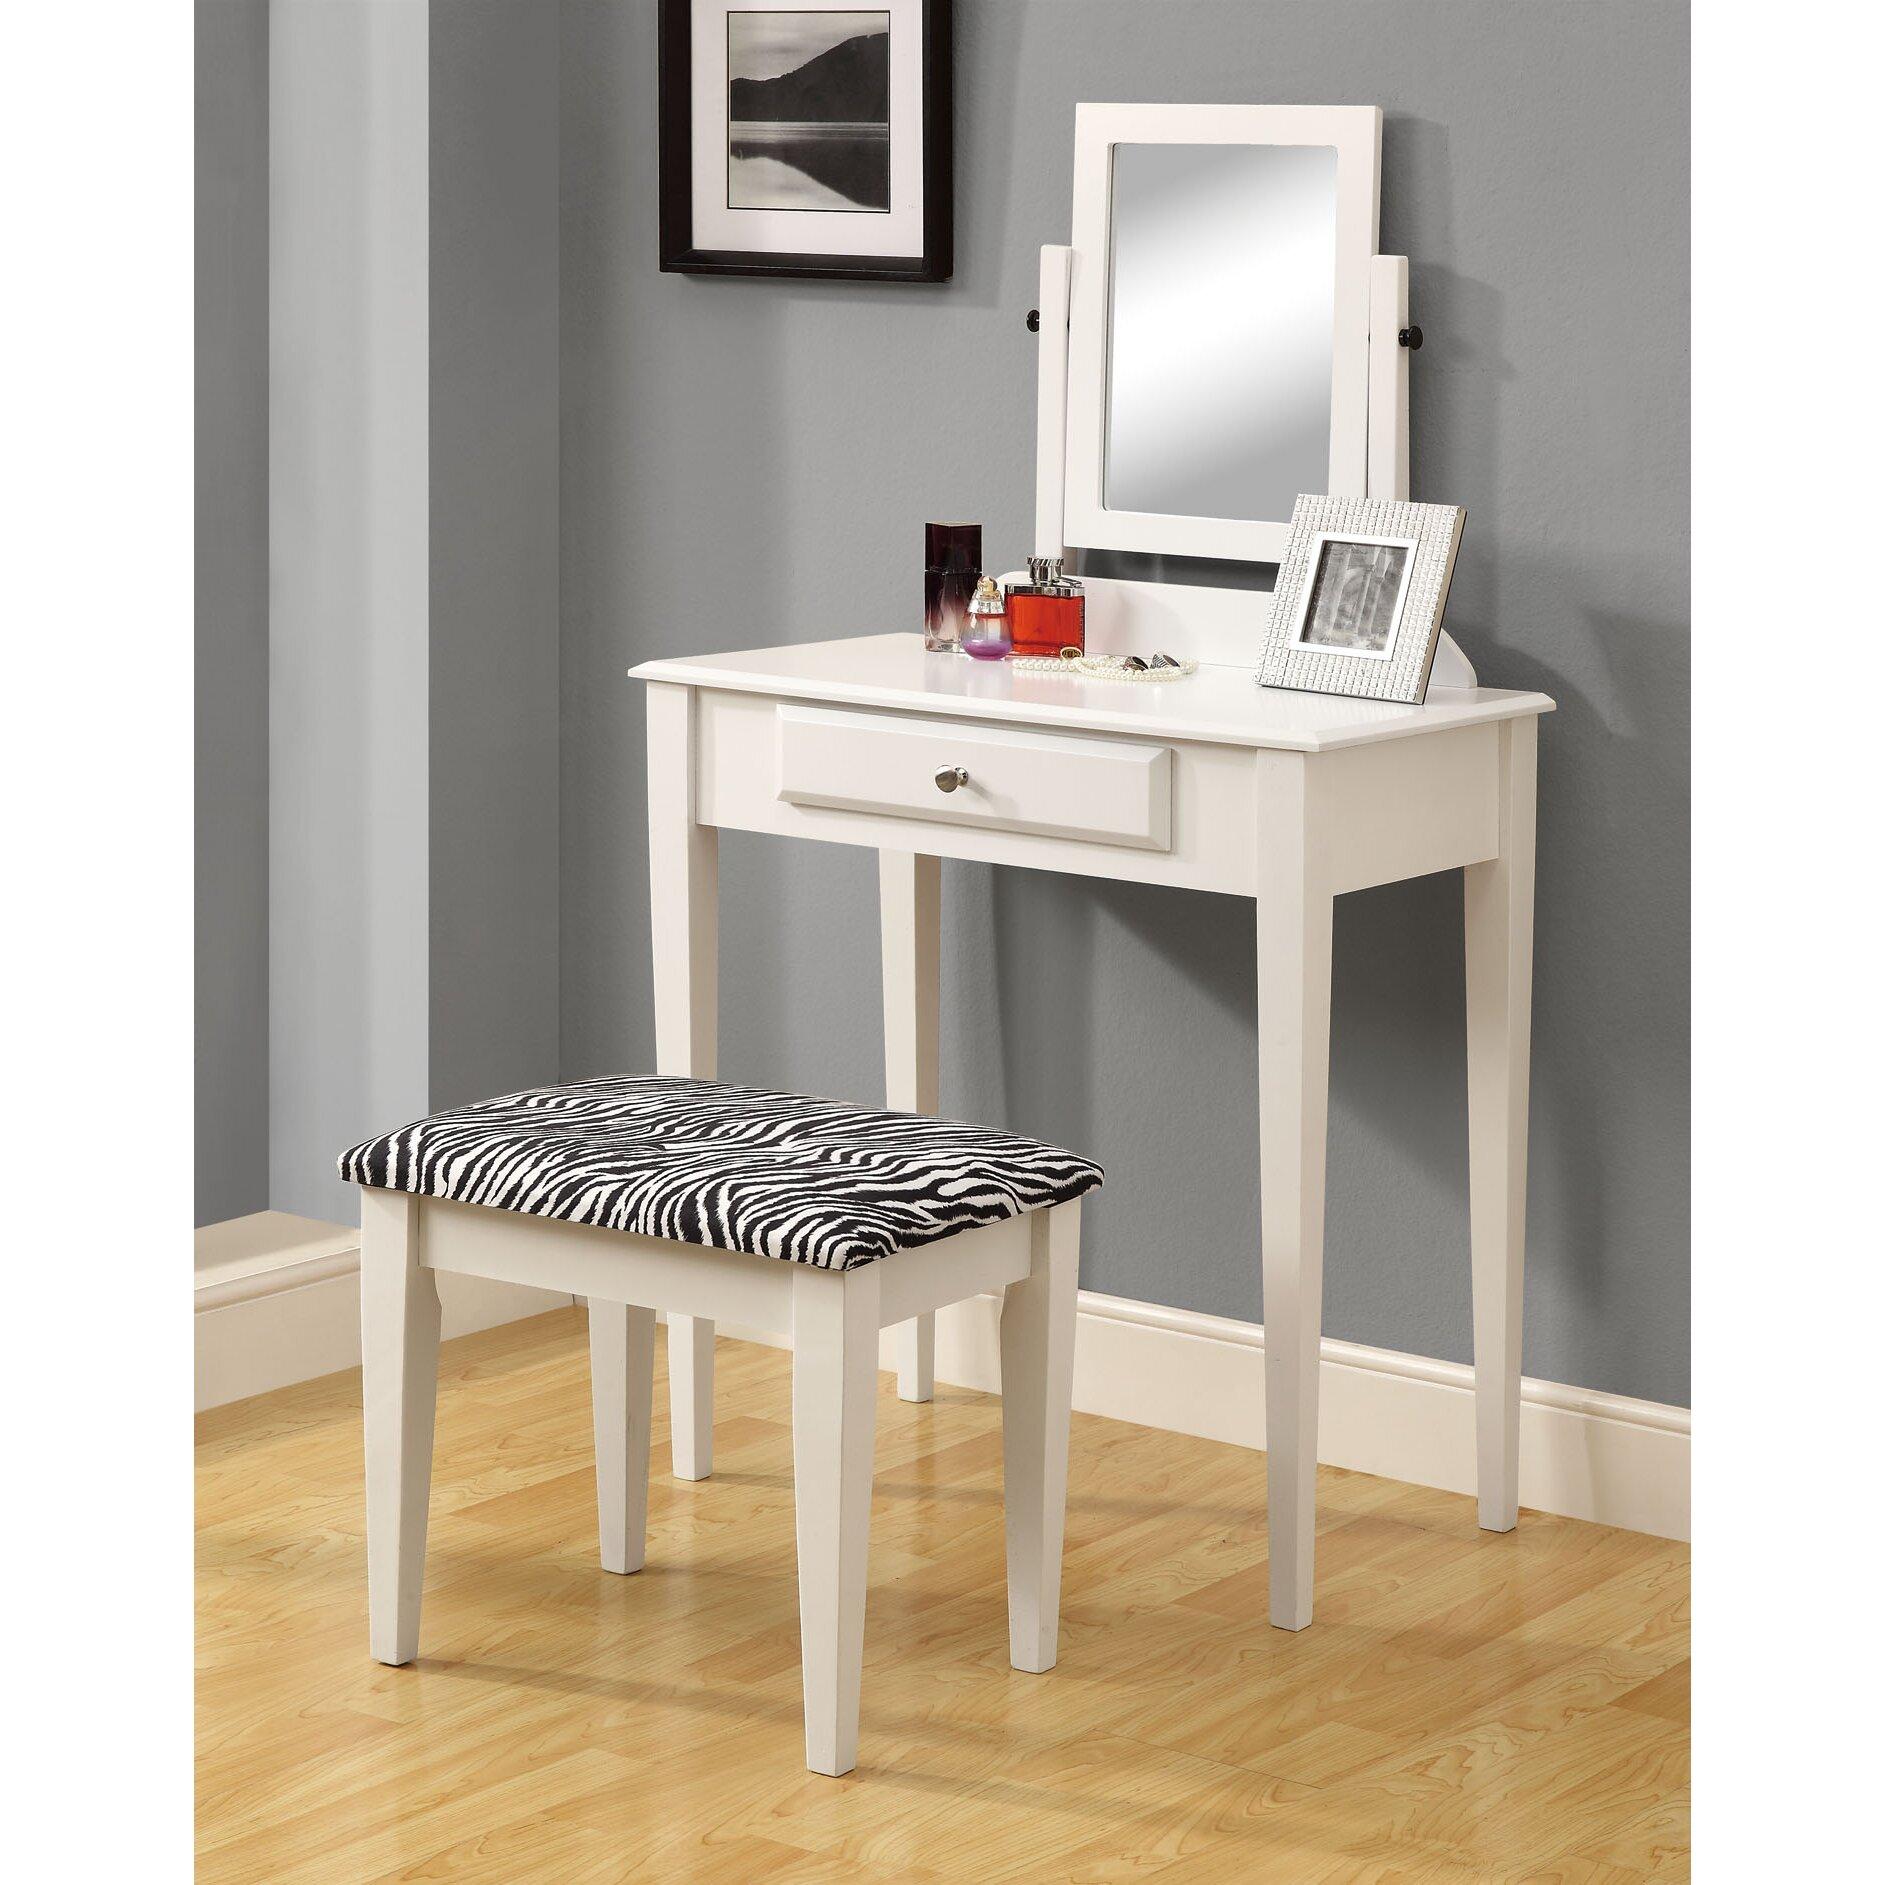 Monarch specialties inc vanity set with mirror zebra for Zebra kitchen set